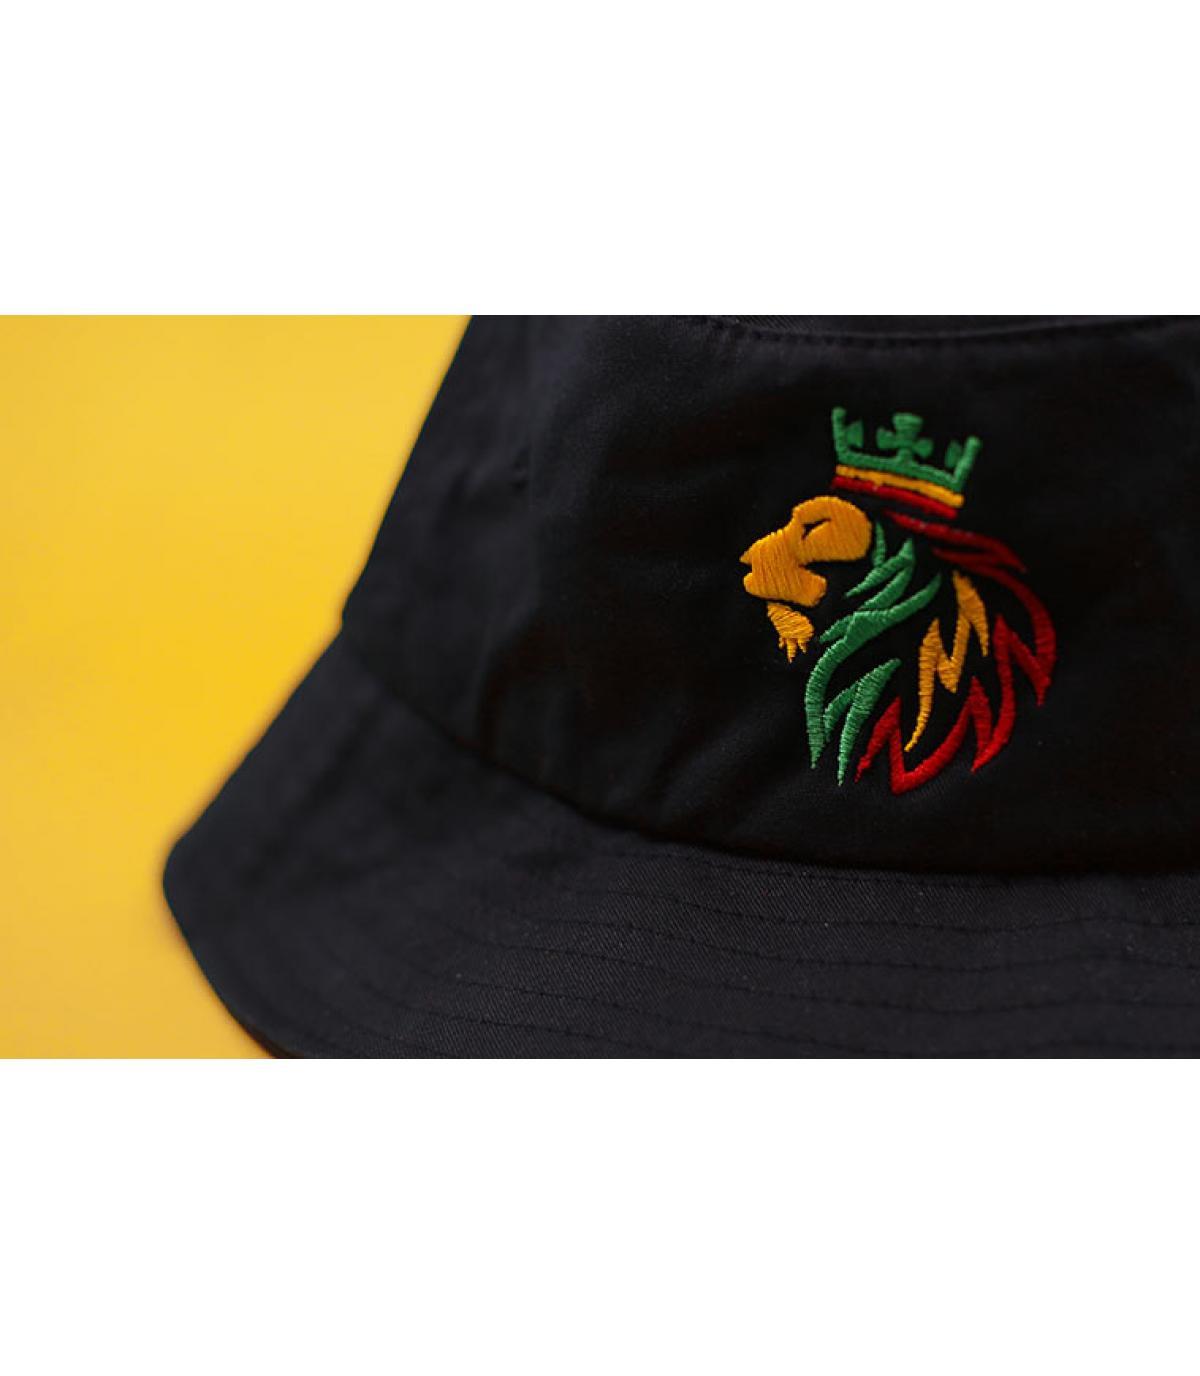 rasta bucket hat - Pacific Vibes Bucket Hat on your headwear shop ... 62ebdc23f85a